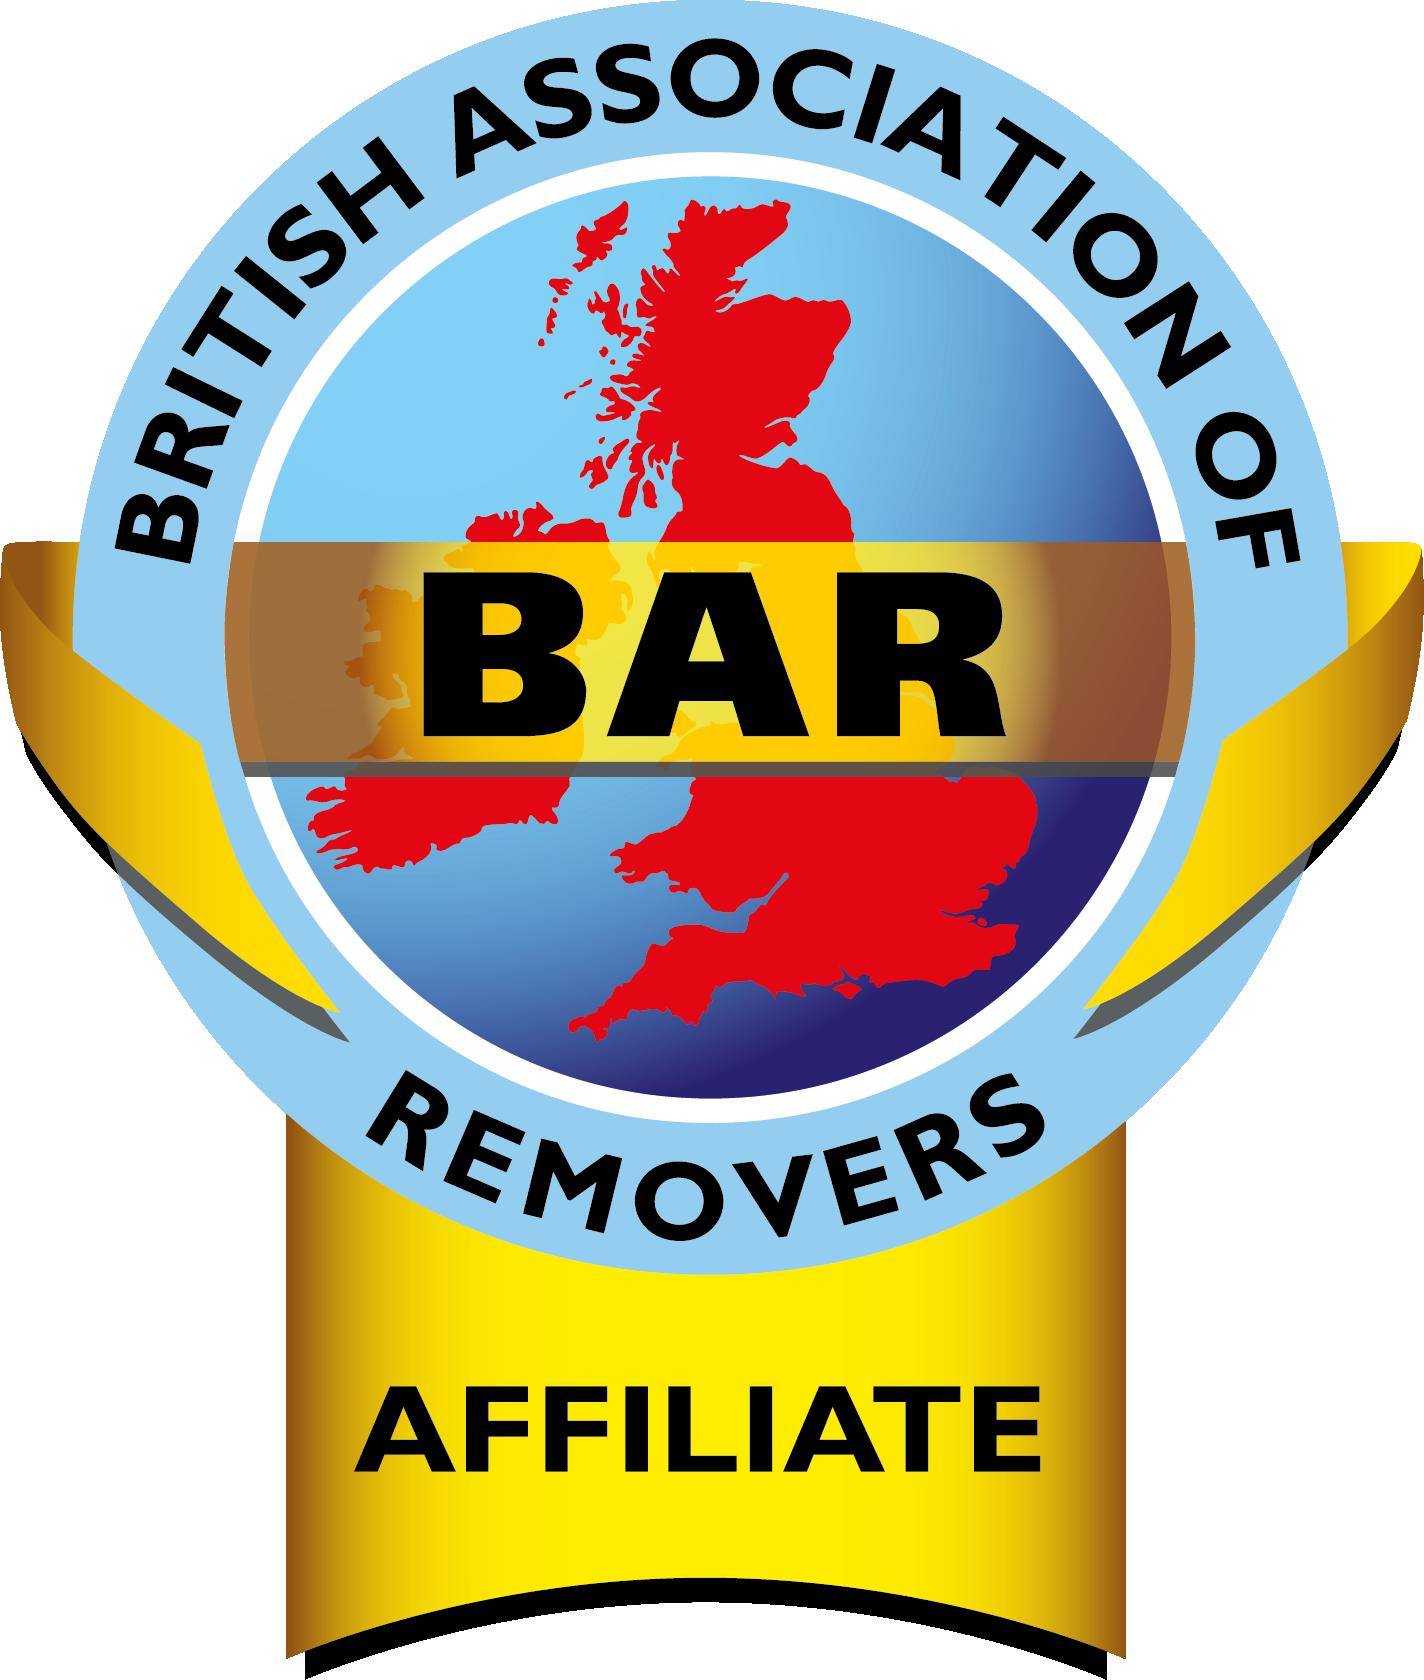 BAR British Association of Removers